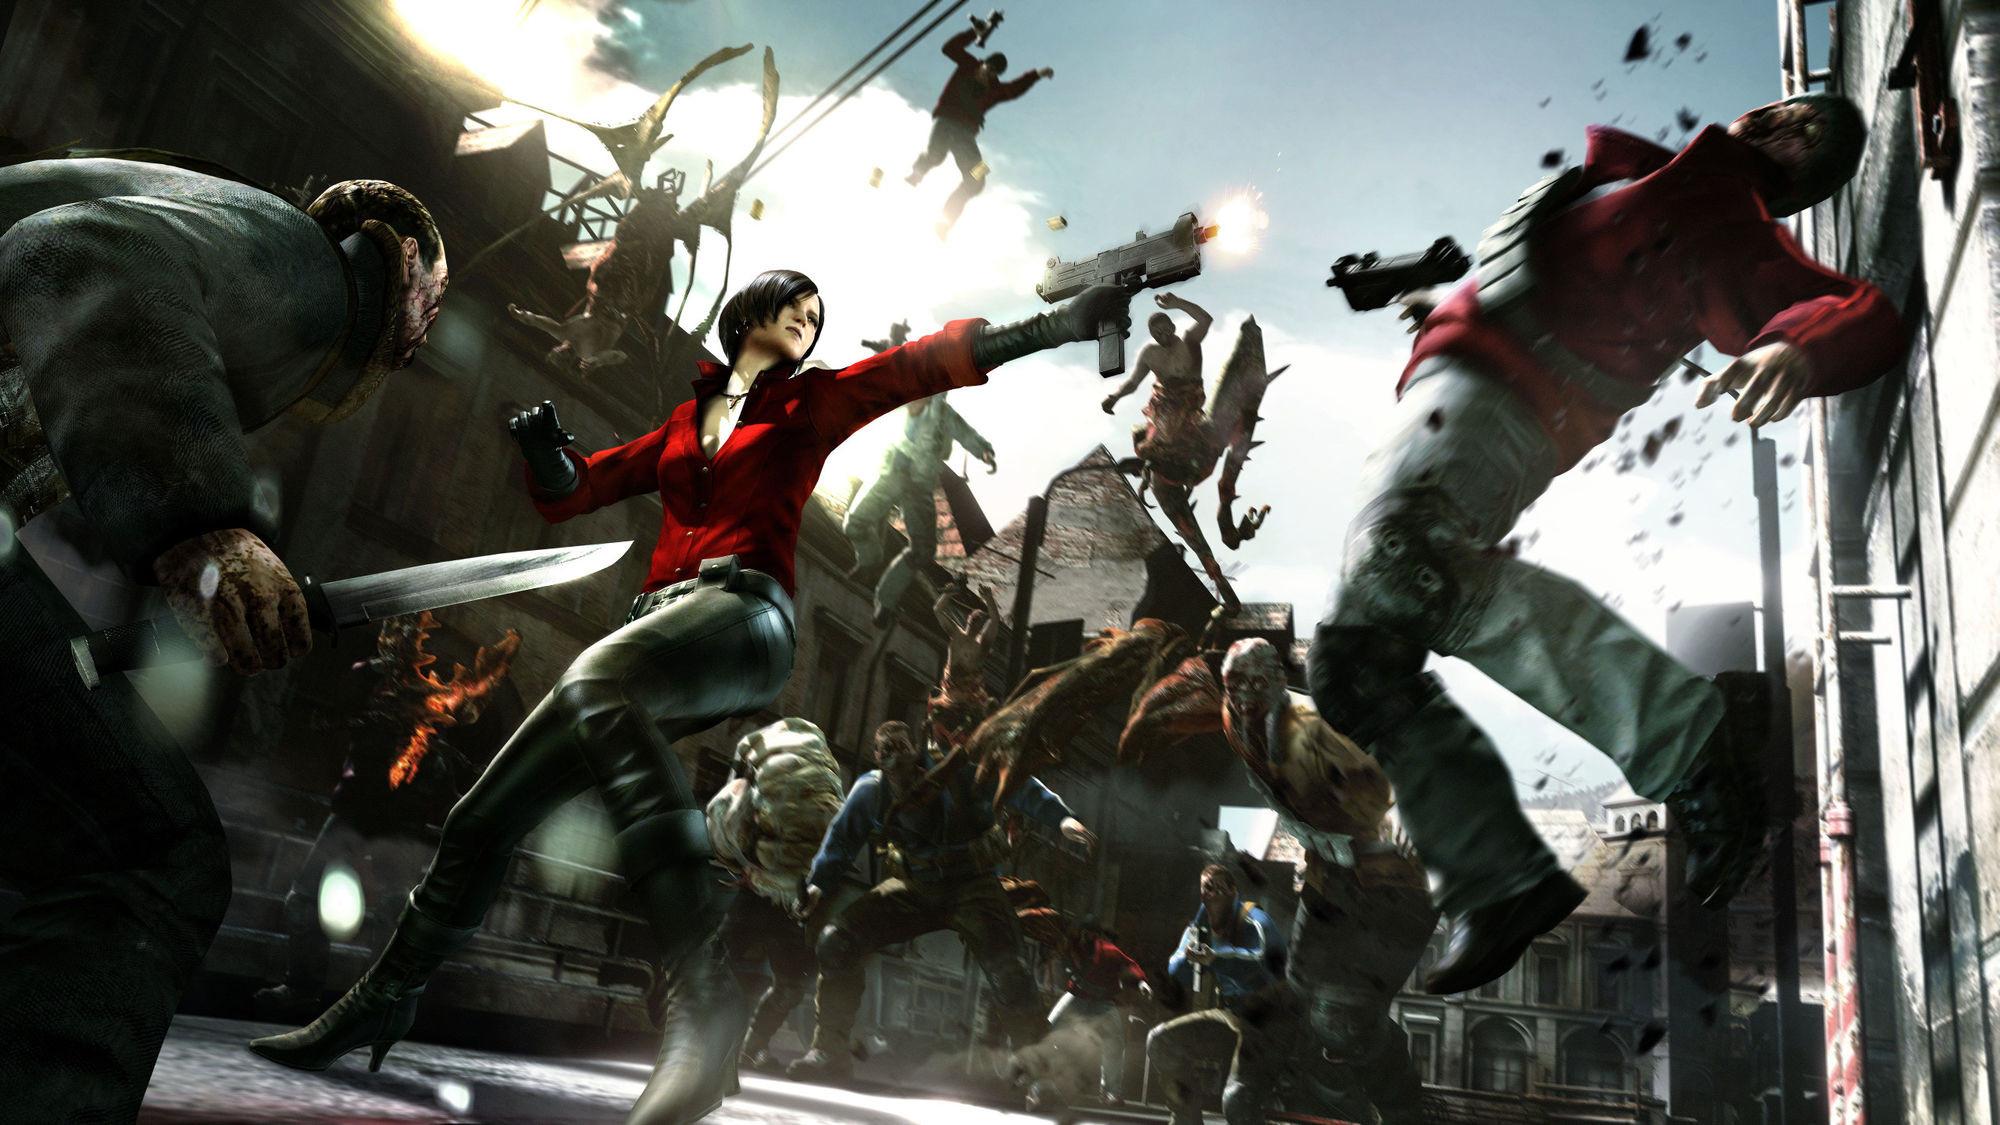 Image – Resident-Evil-6-Wallpaper-HD-Ada-Wong.jpg   Resident Evil Wiki    FANDOM powered by Wikia